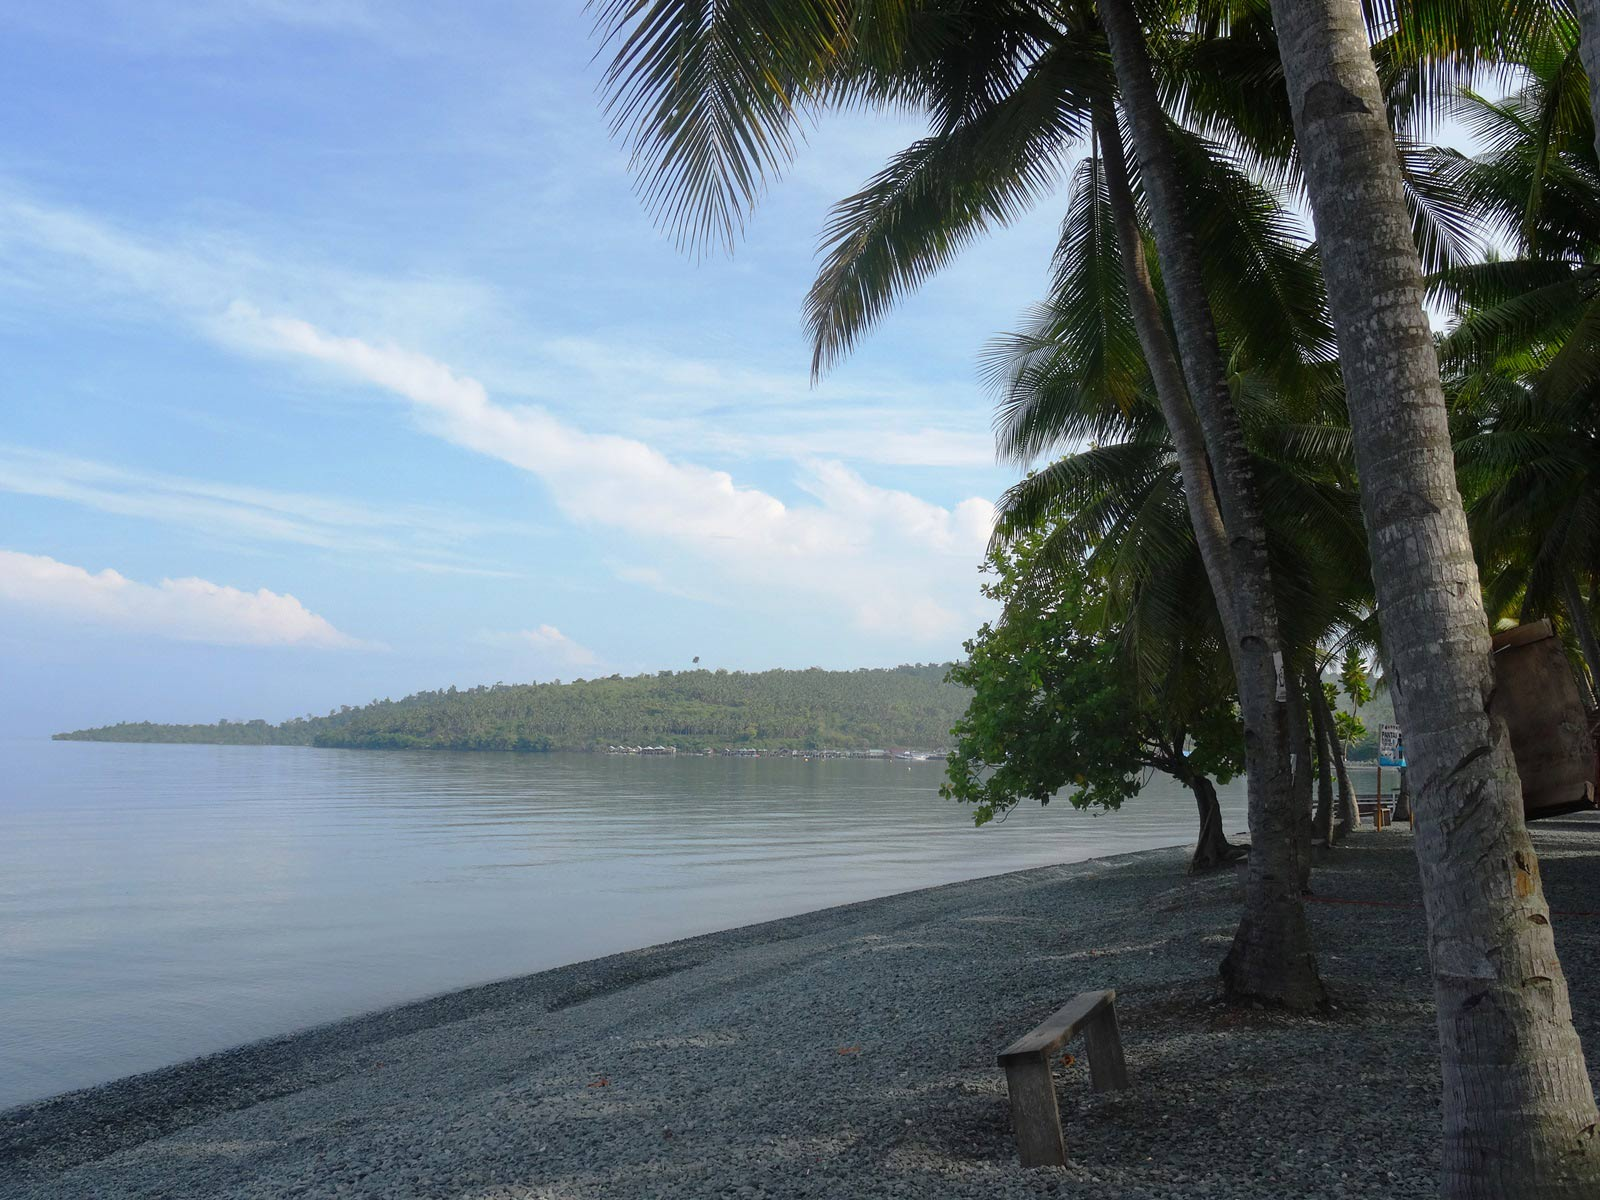 https://cdn.ramatours.nl/content/uploads/2018/04/rondreis-indonesie-sulawesi-ampana-1.jpg